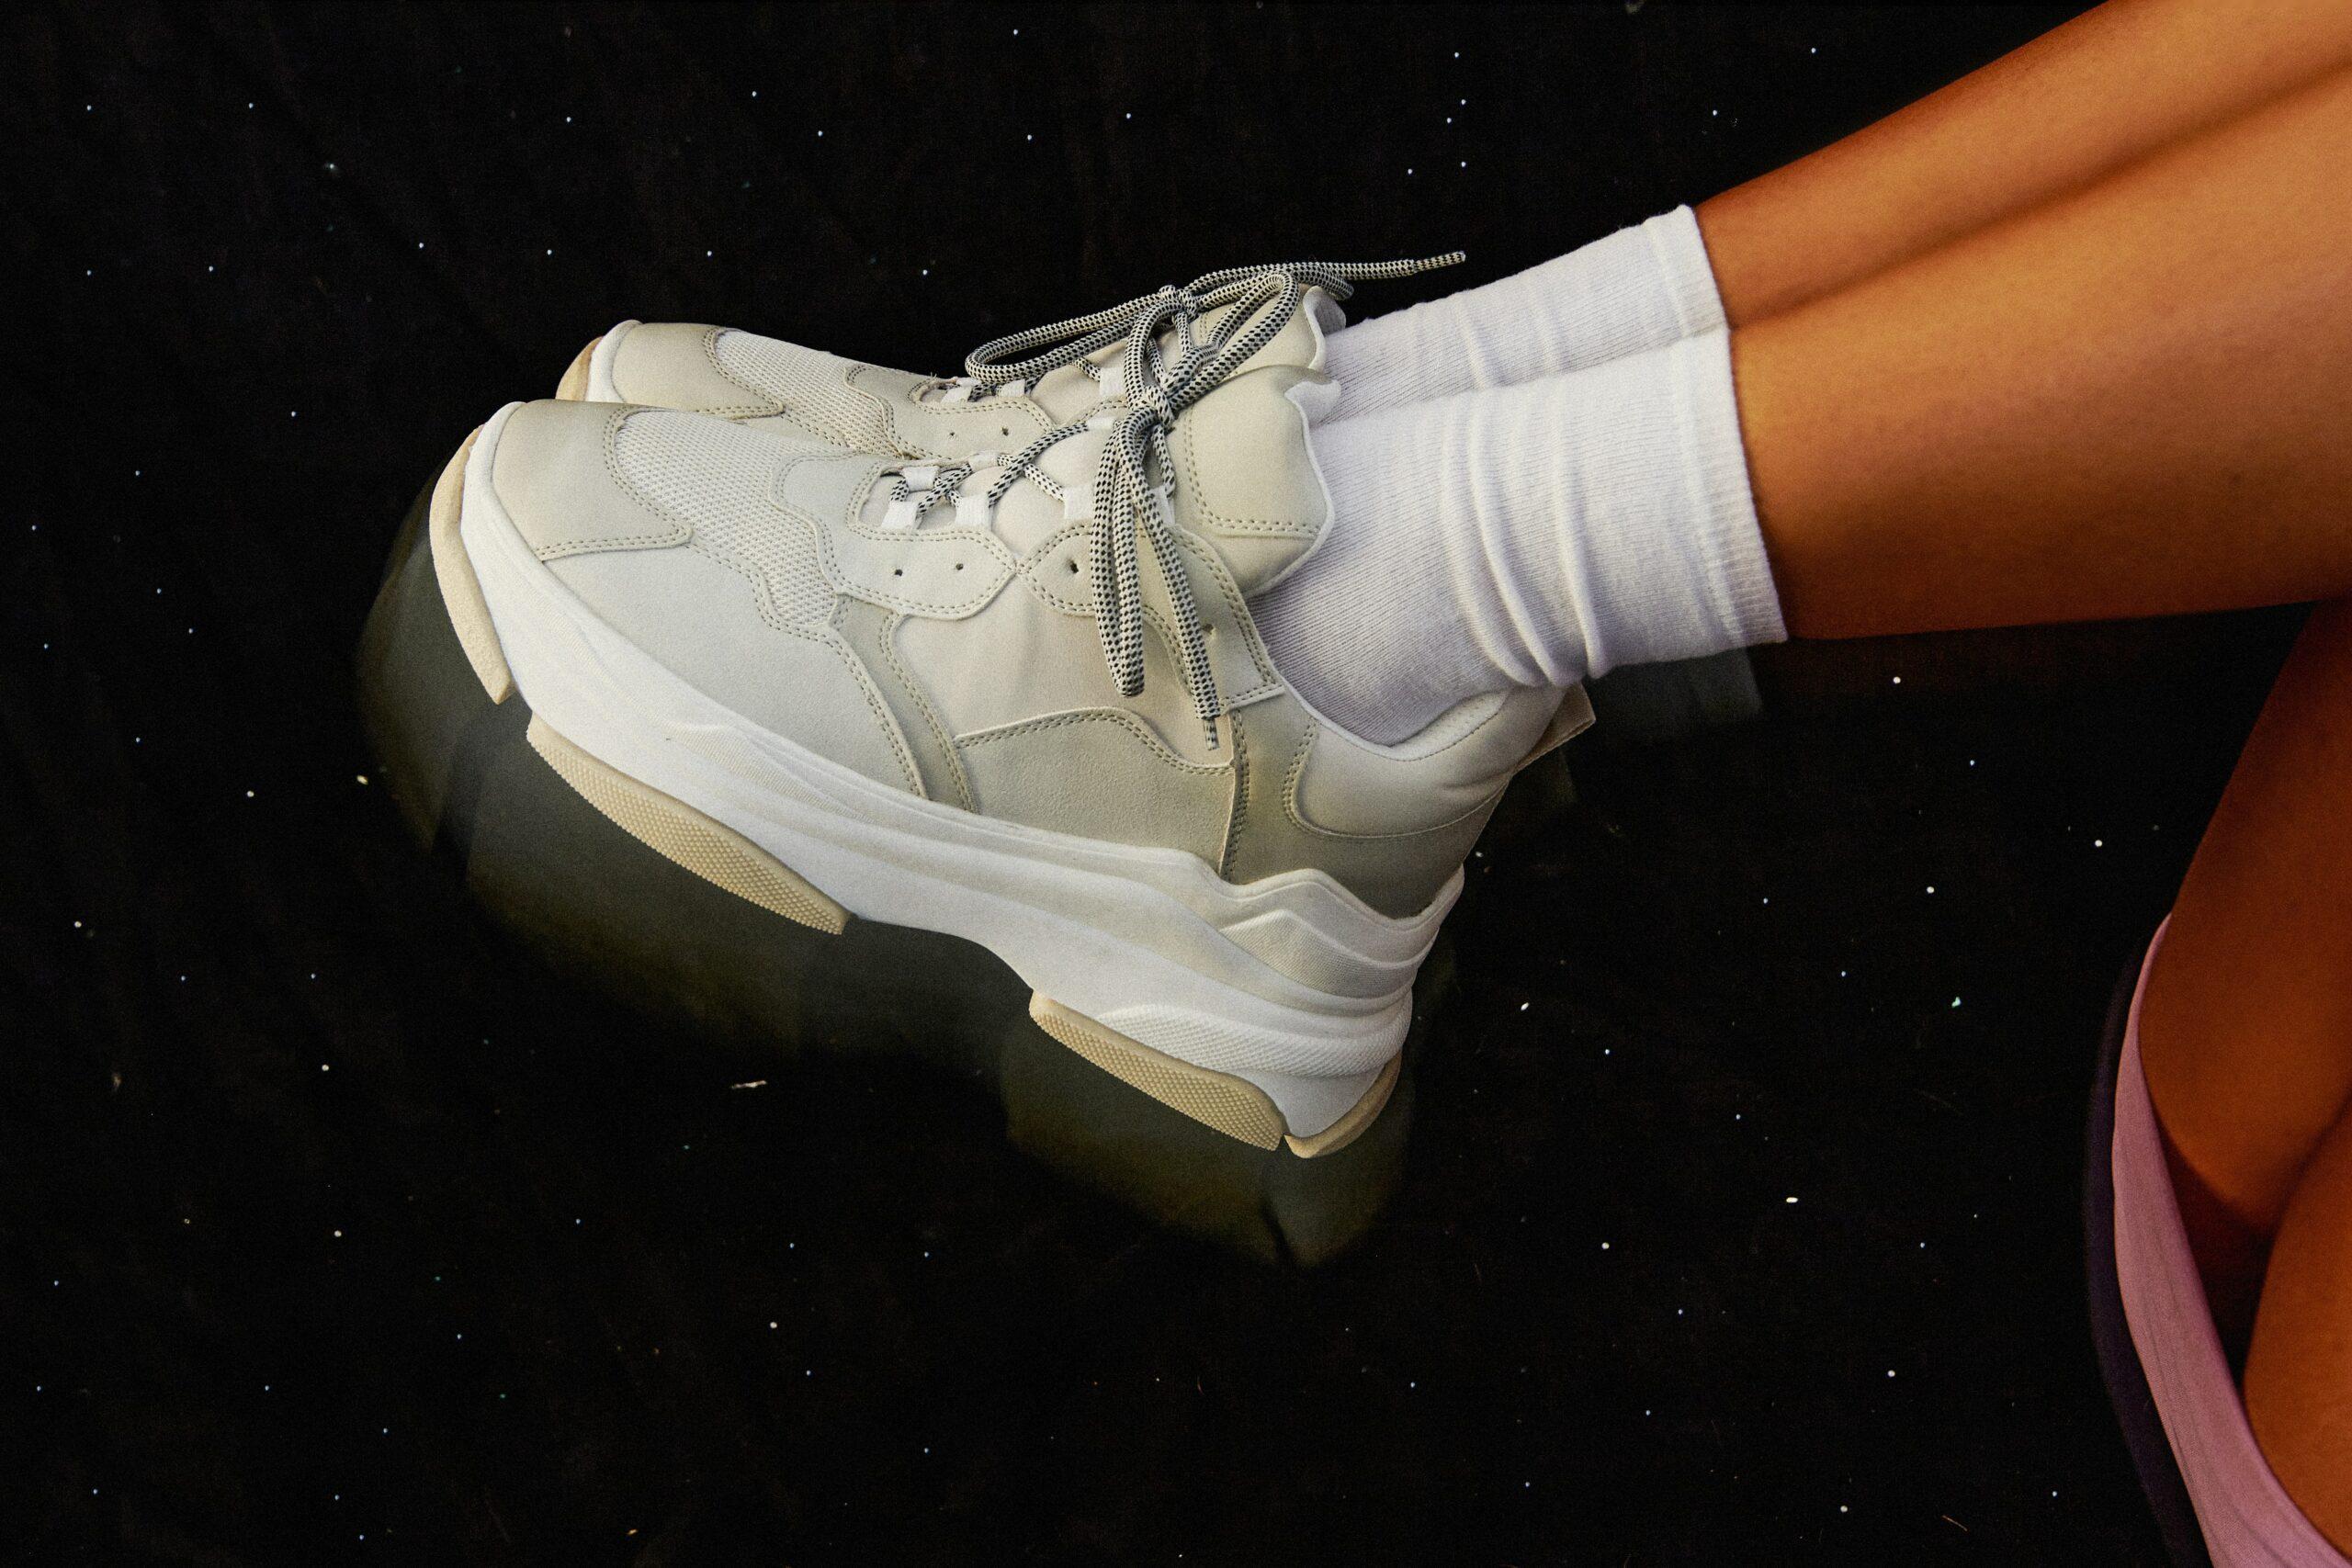 calzado deportivo casual